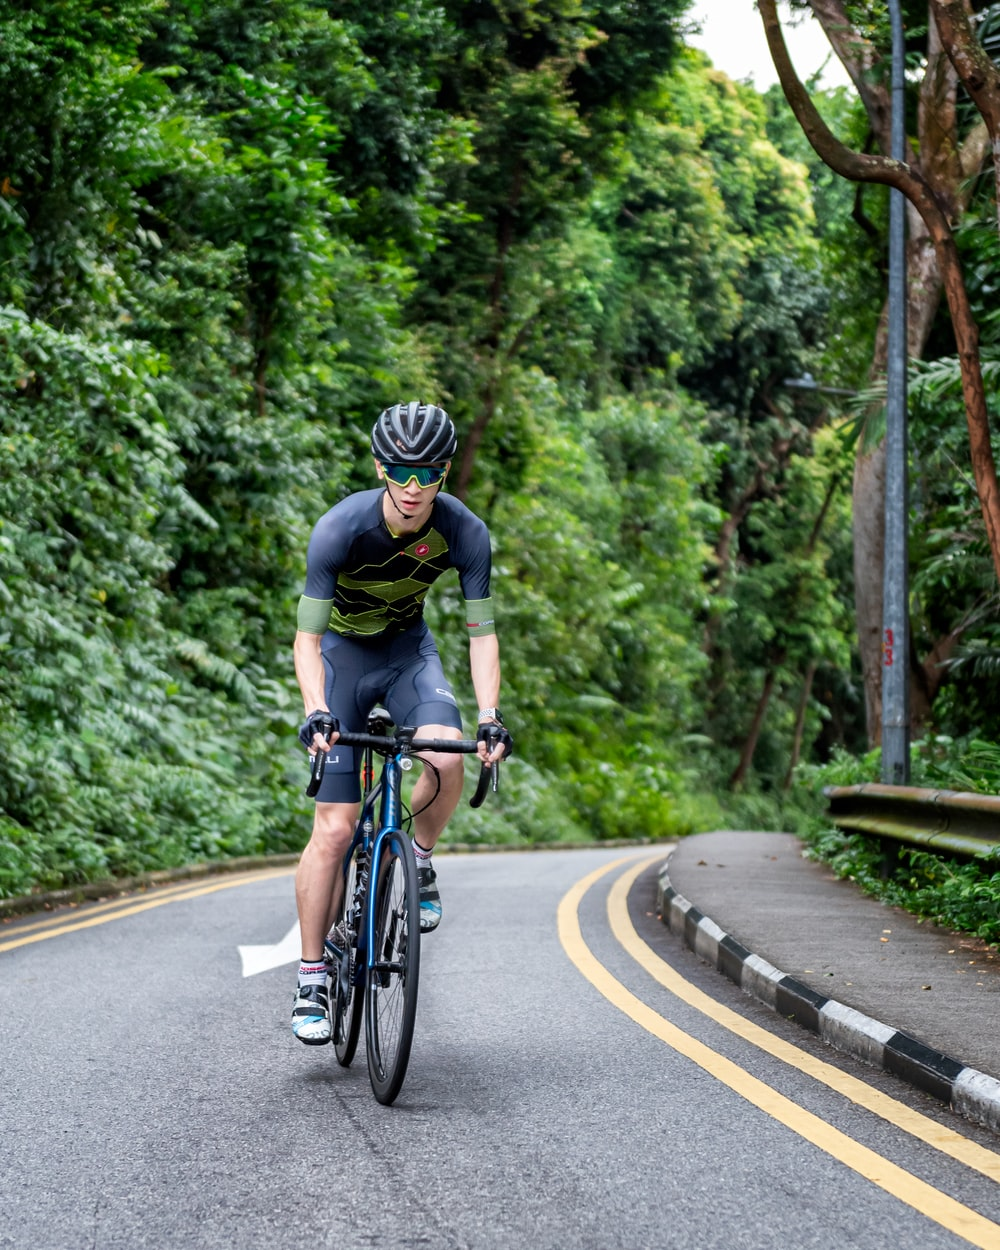 man in black shirt riding on bicycle on road during daytime